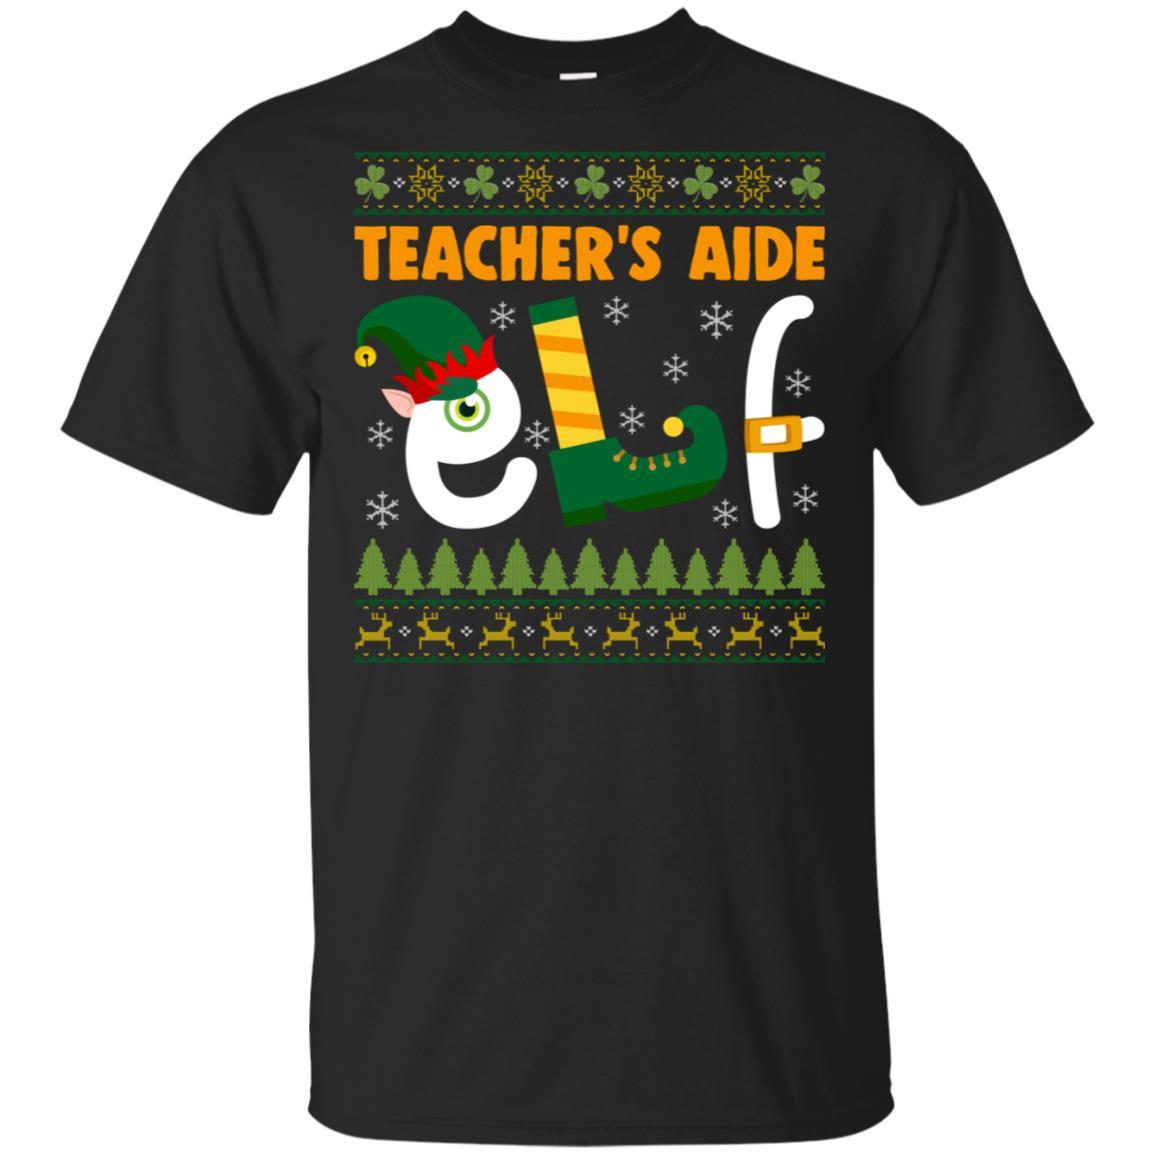 Teacher's Aide Elf Unisex Short Sleeve